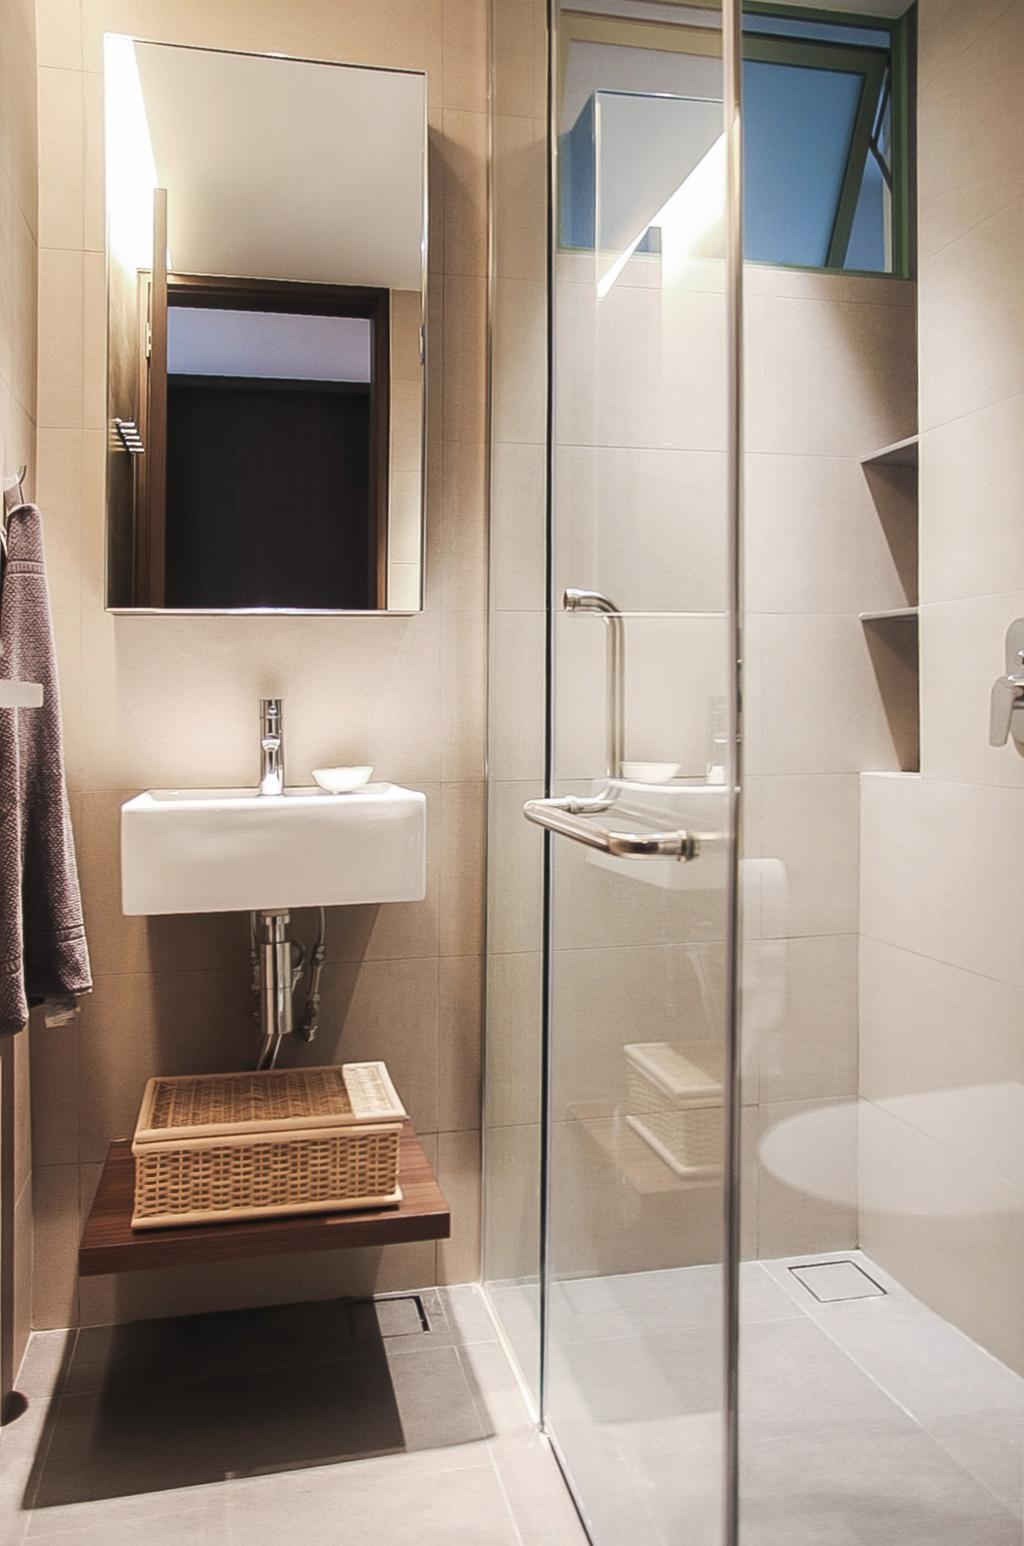 Modern, Condo, Bathroom, Tiara, Architect, JOW Architects, Shower Door, Glass Screen, Vanity Sink, Elegant, Hotel, Suite, Indoors, Interior Design, Room